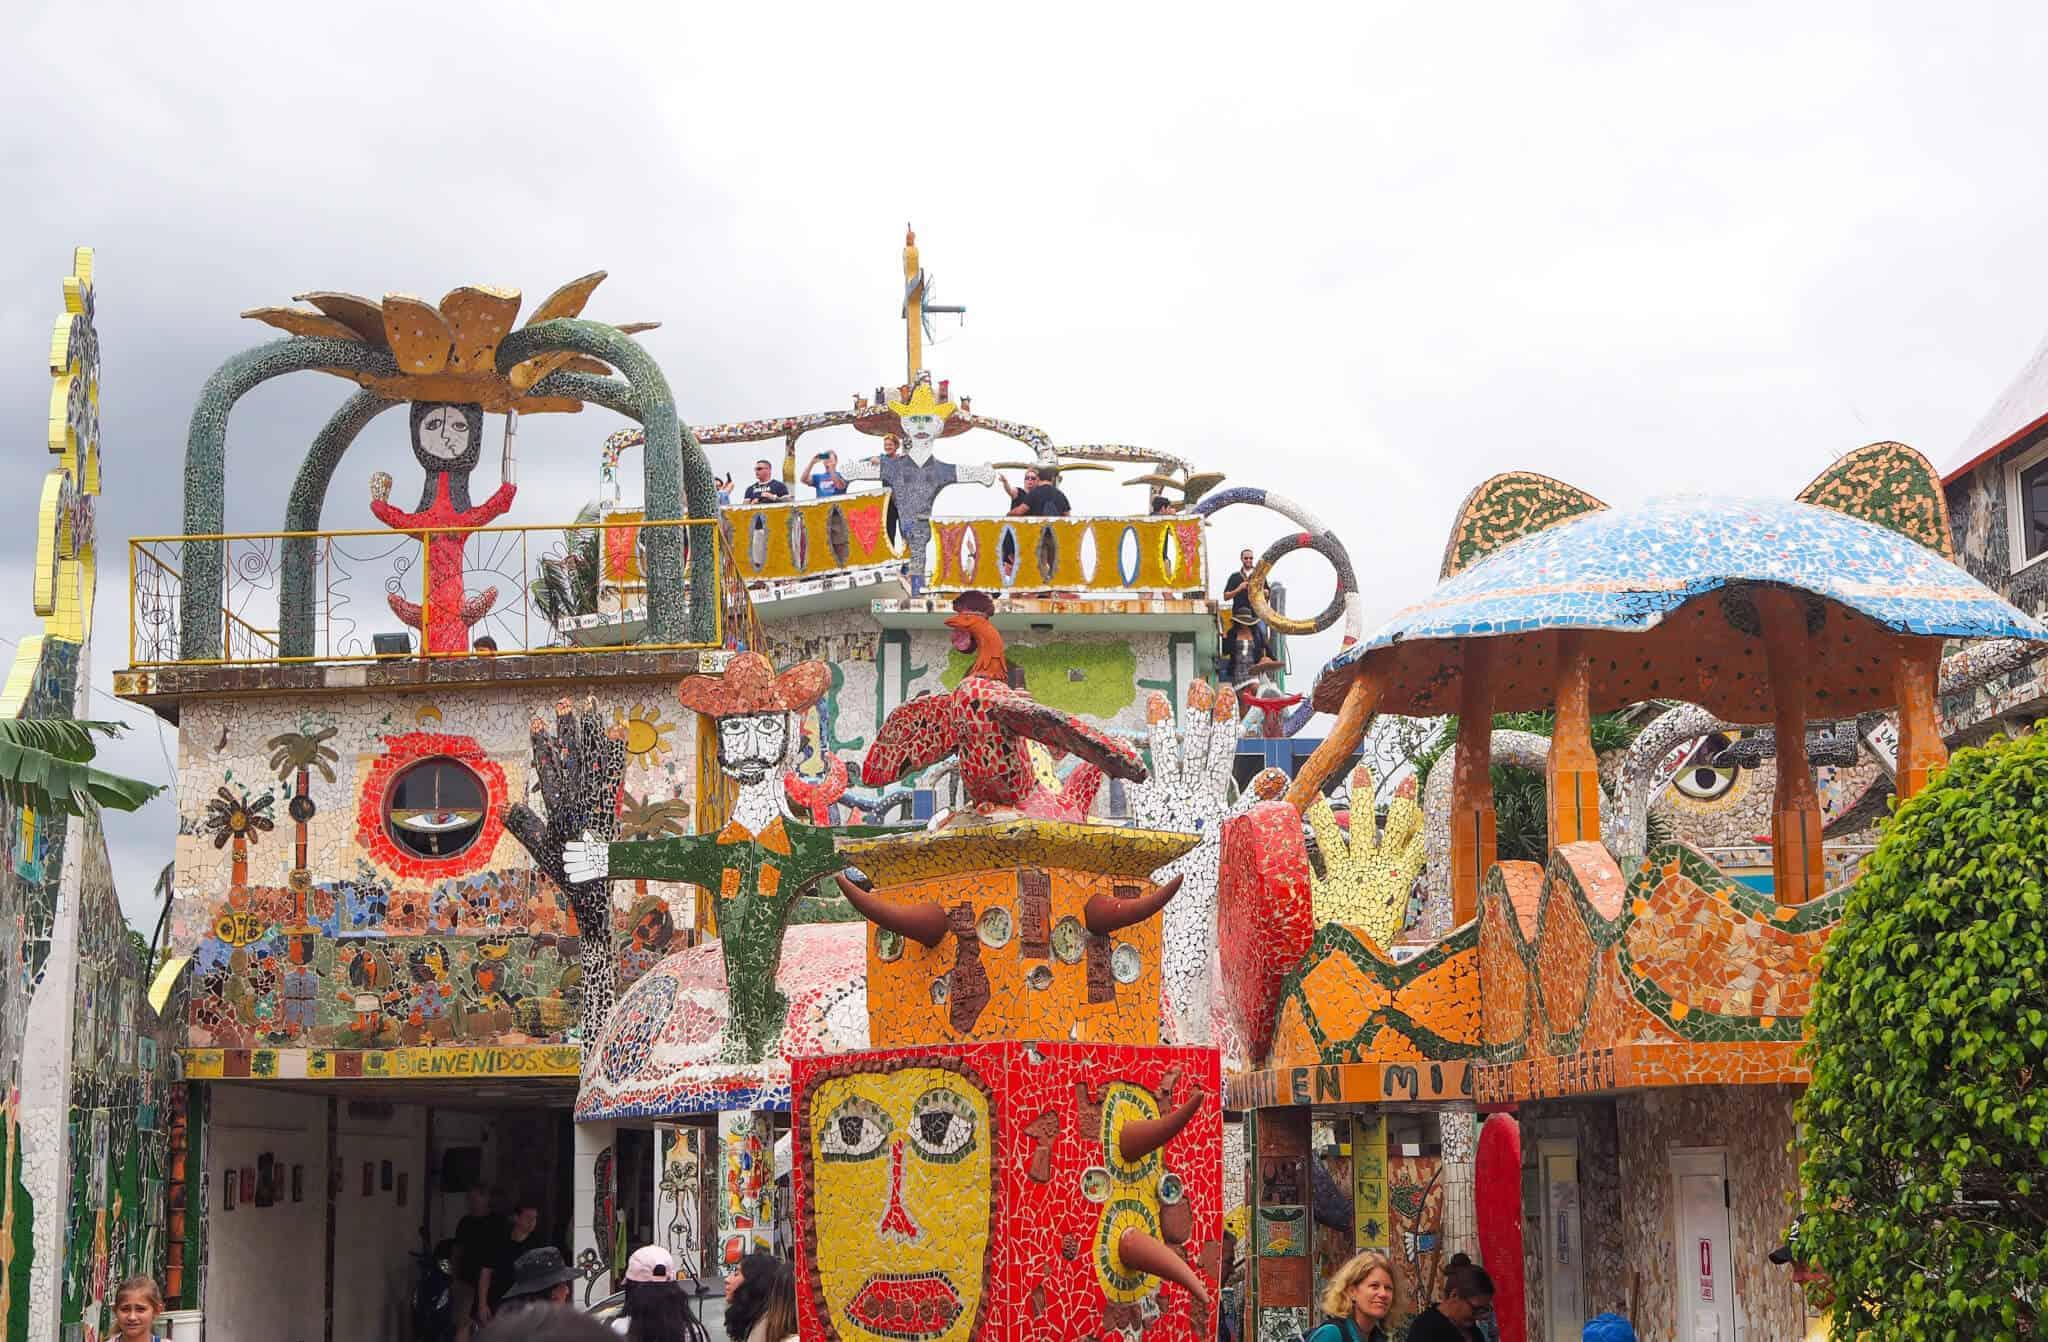 Fusterlandia: Cuban Mosaic Art Installation